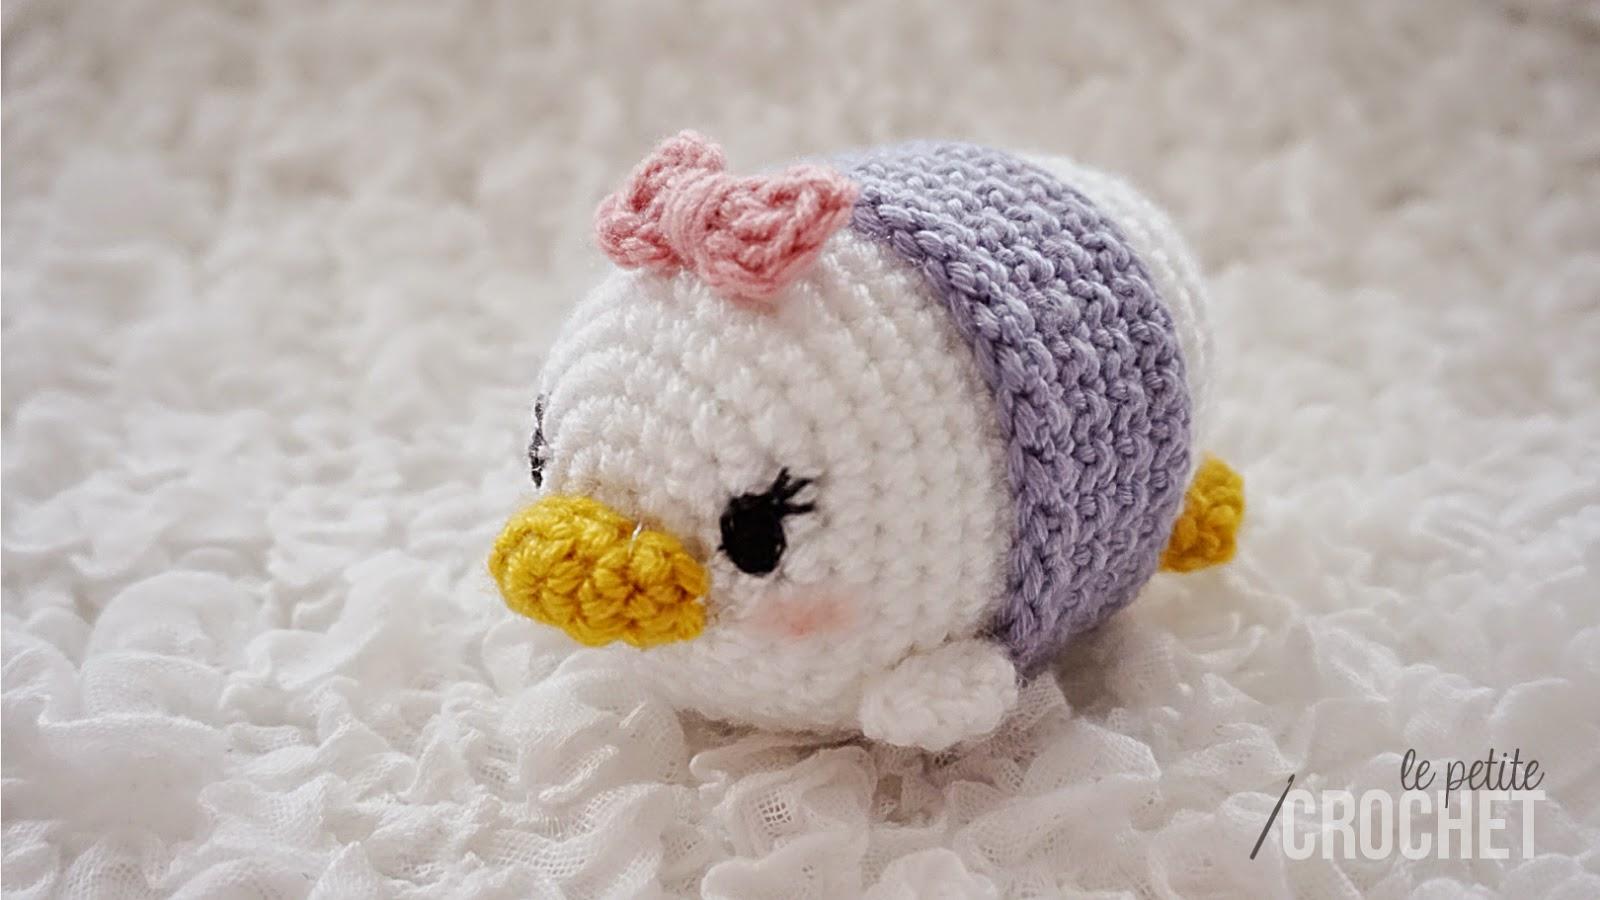 le petite crochet: Tsum Tsum Crochet Project for 2015